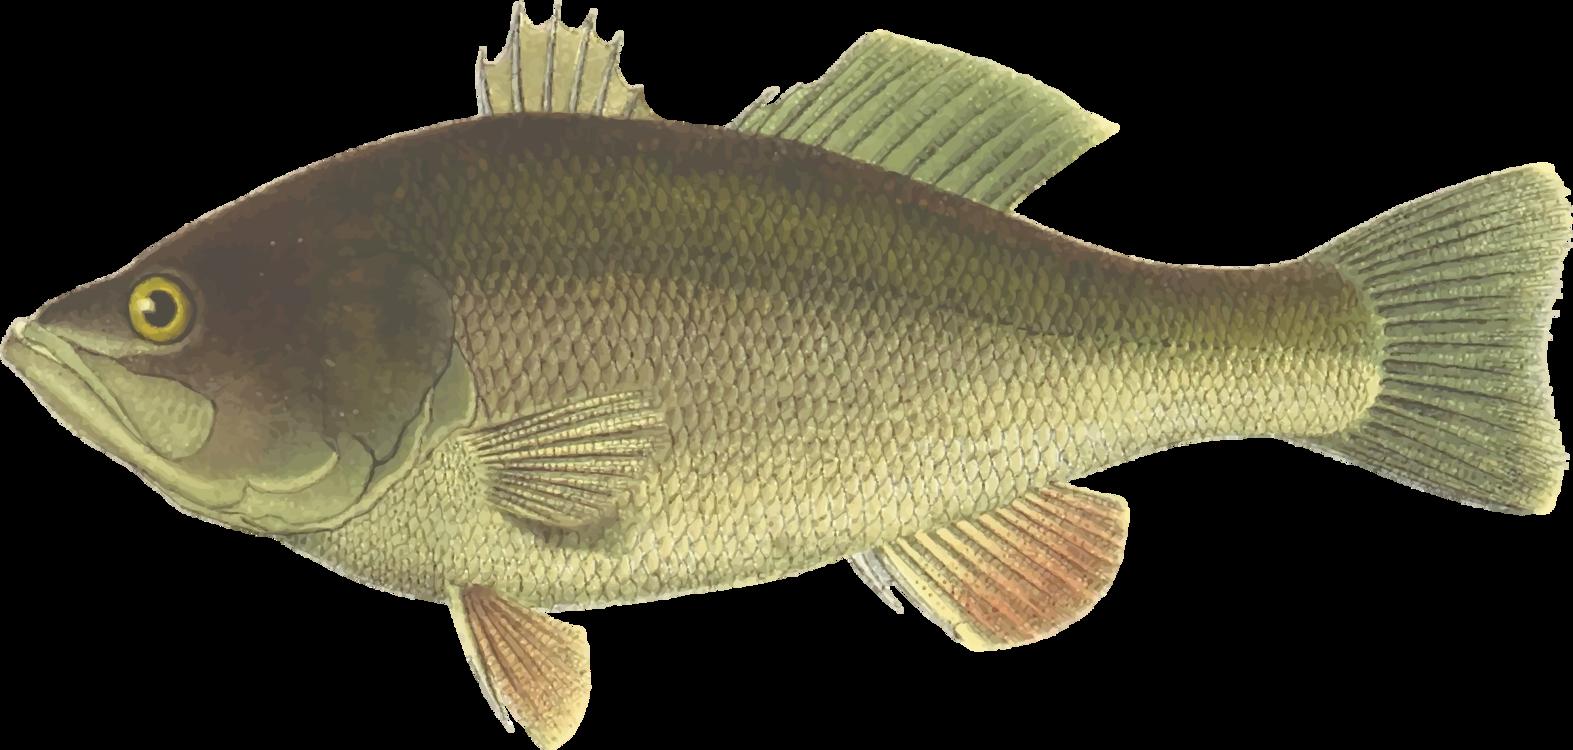 Perch,Tilapia,Bony Fish